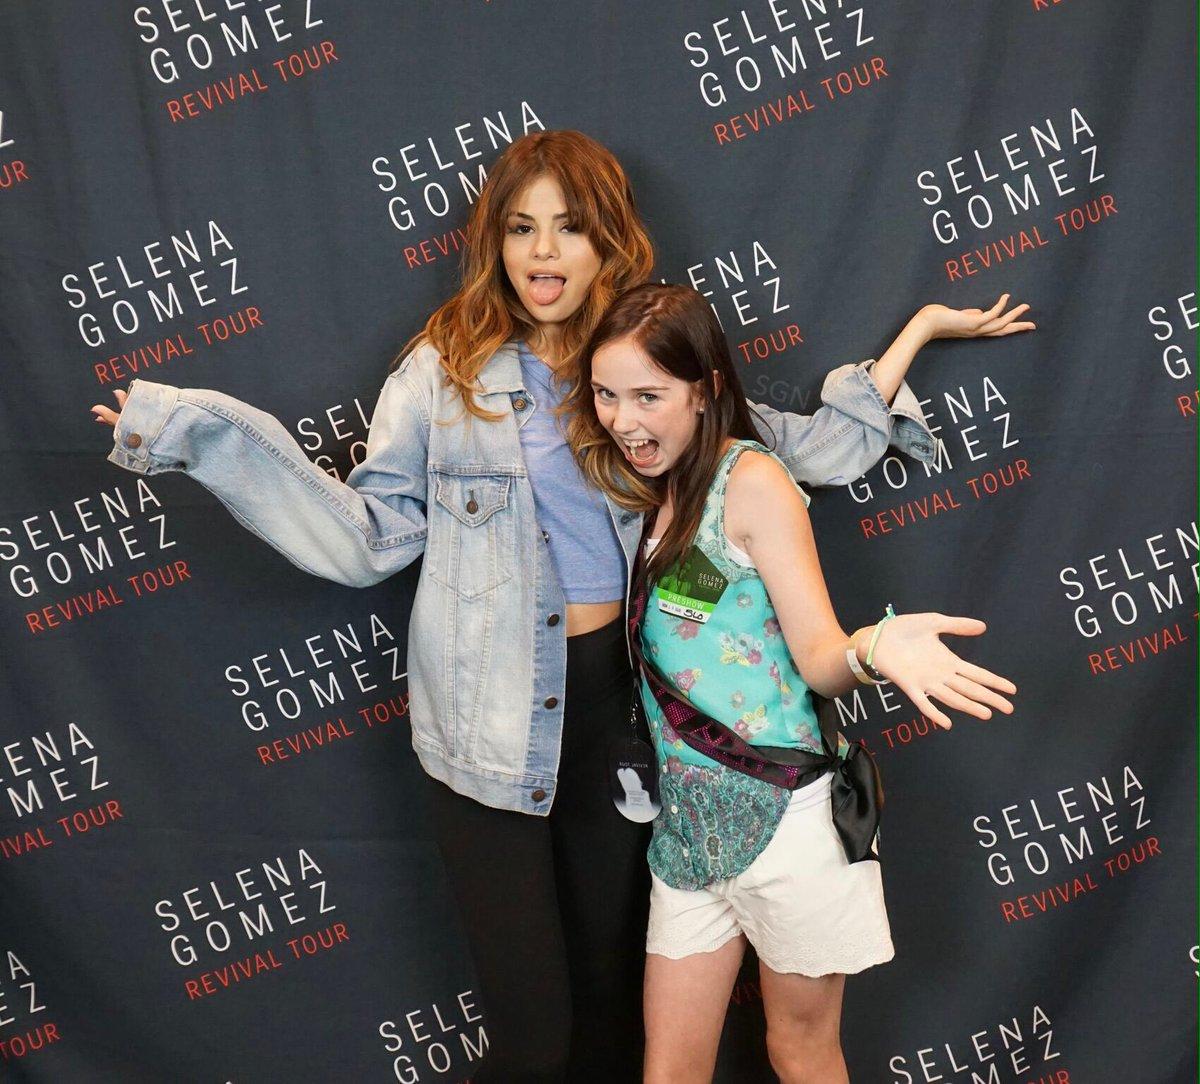 Selena Gomez News On Twitter Tulsa Meet Greet Revivaltour